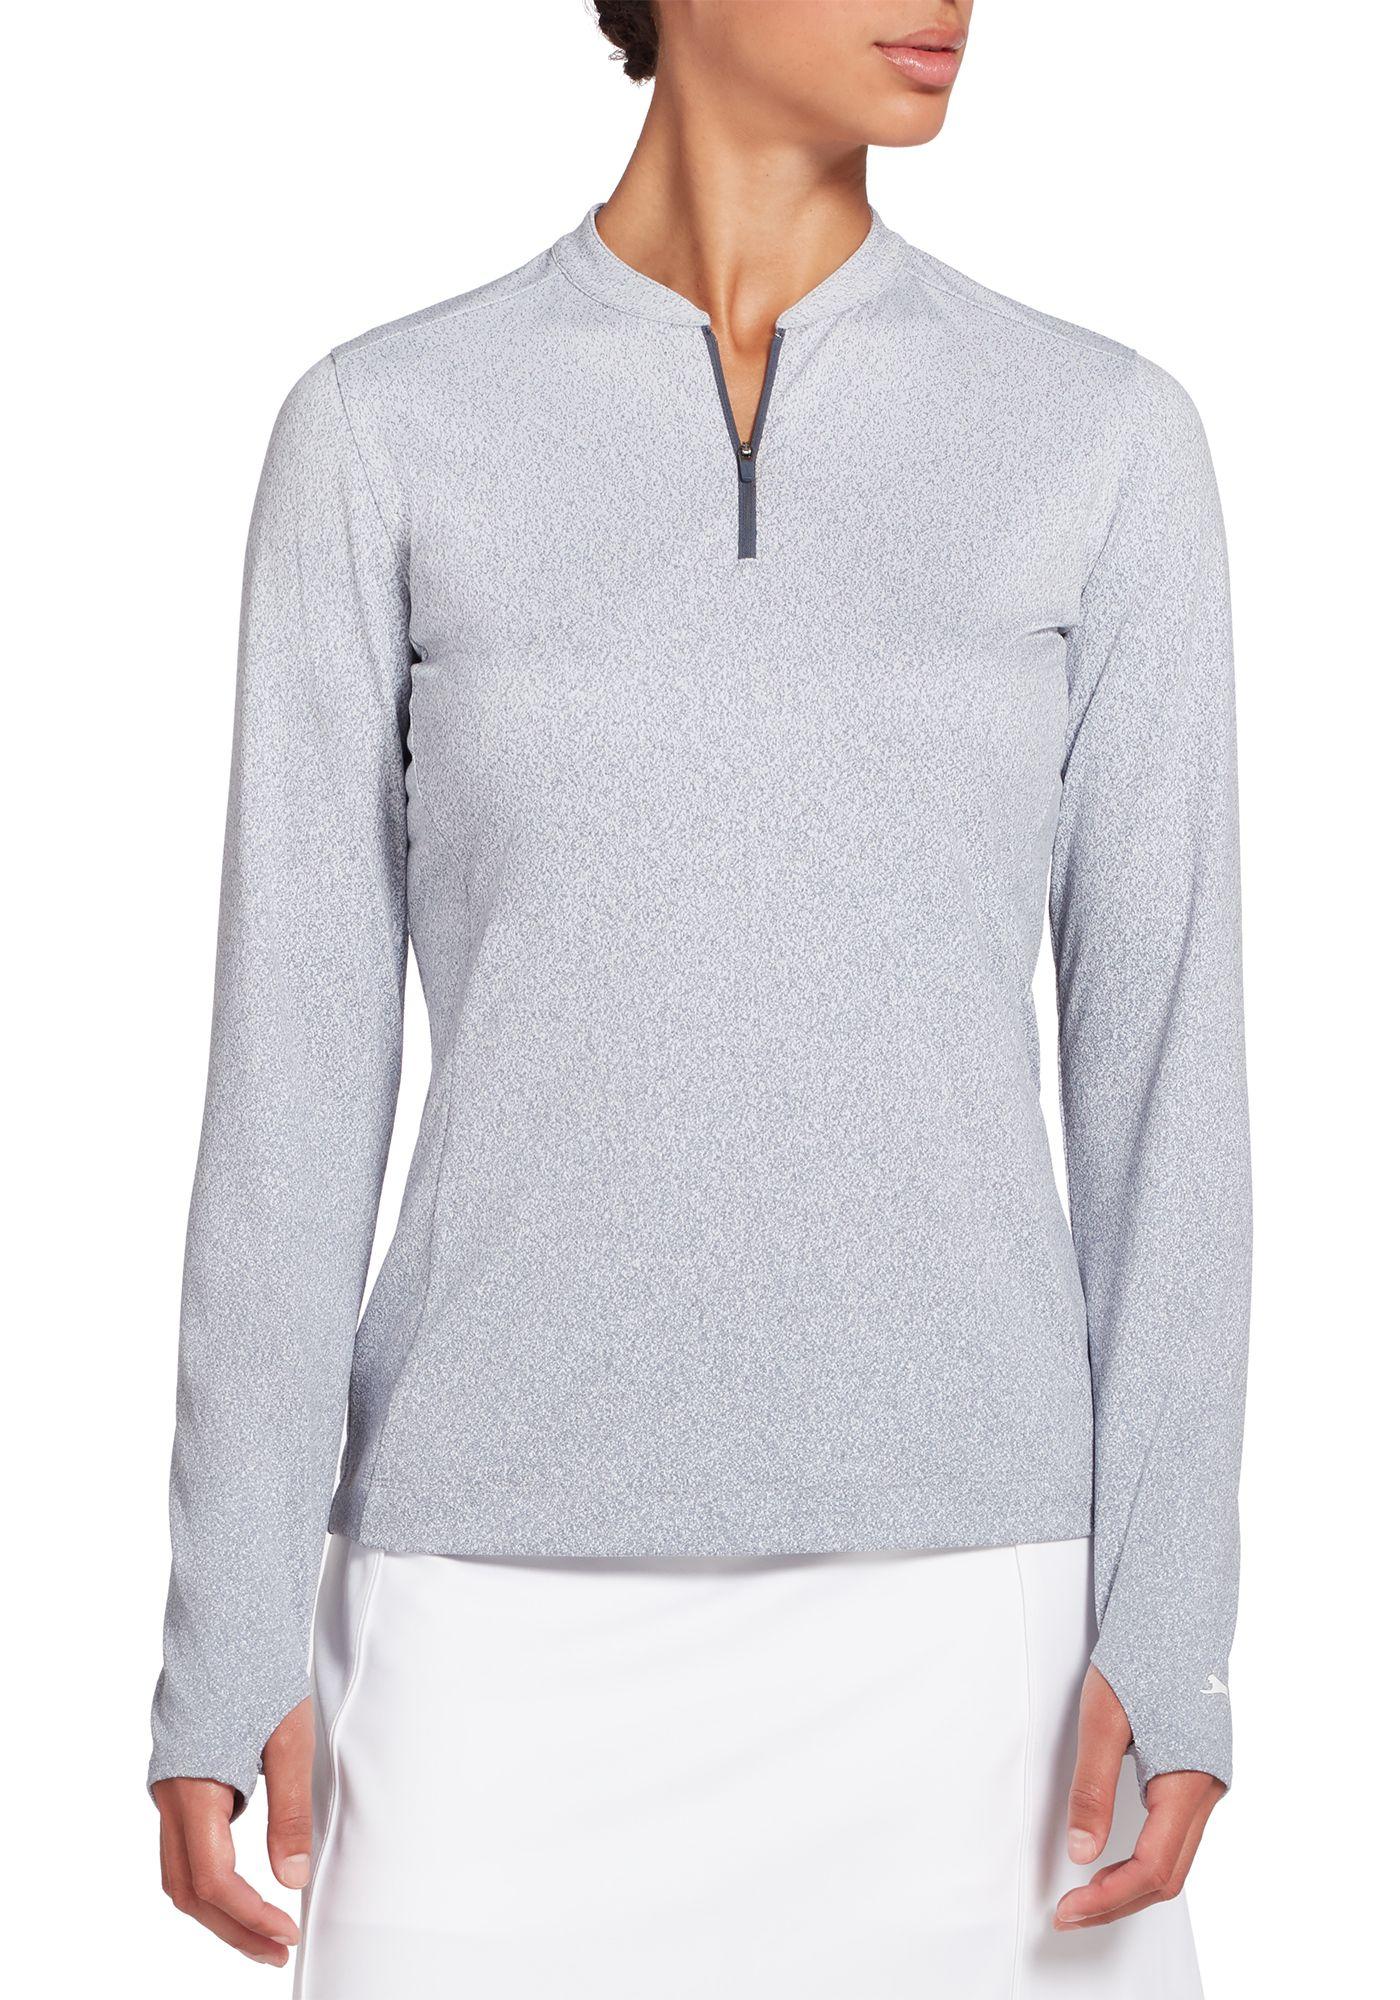 Slazenger Women's Ombre ¼-Zip Golf Pullover